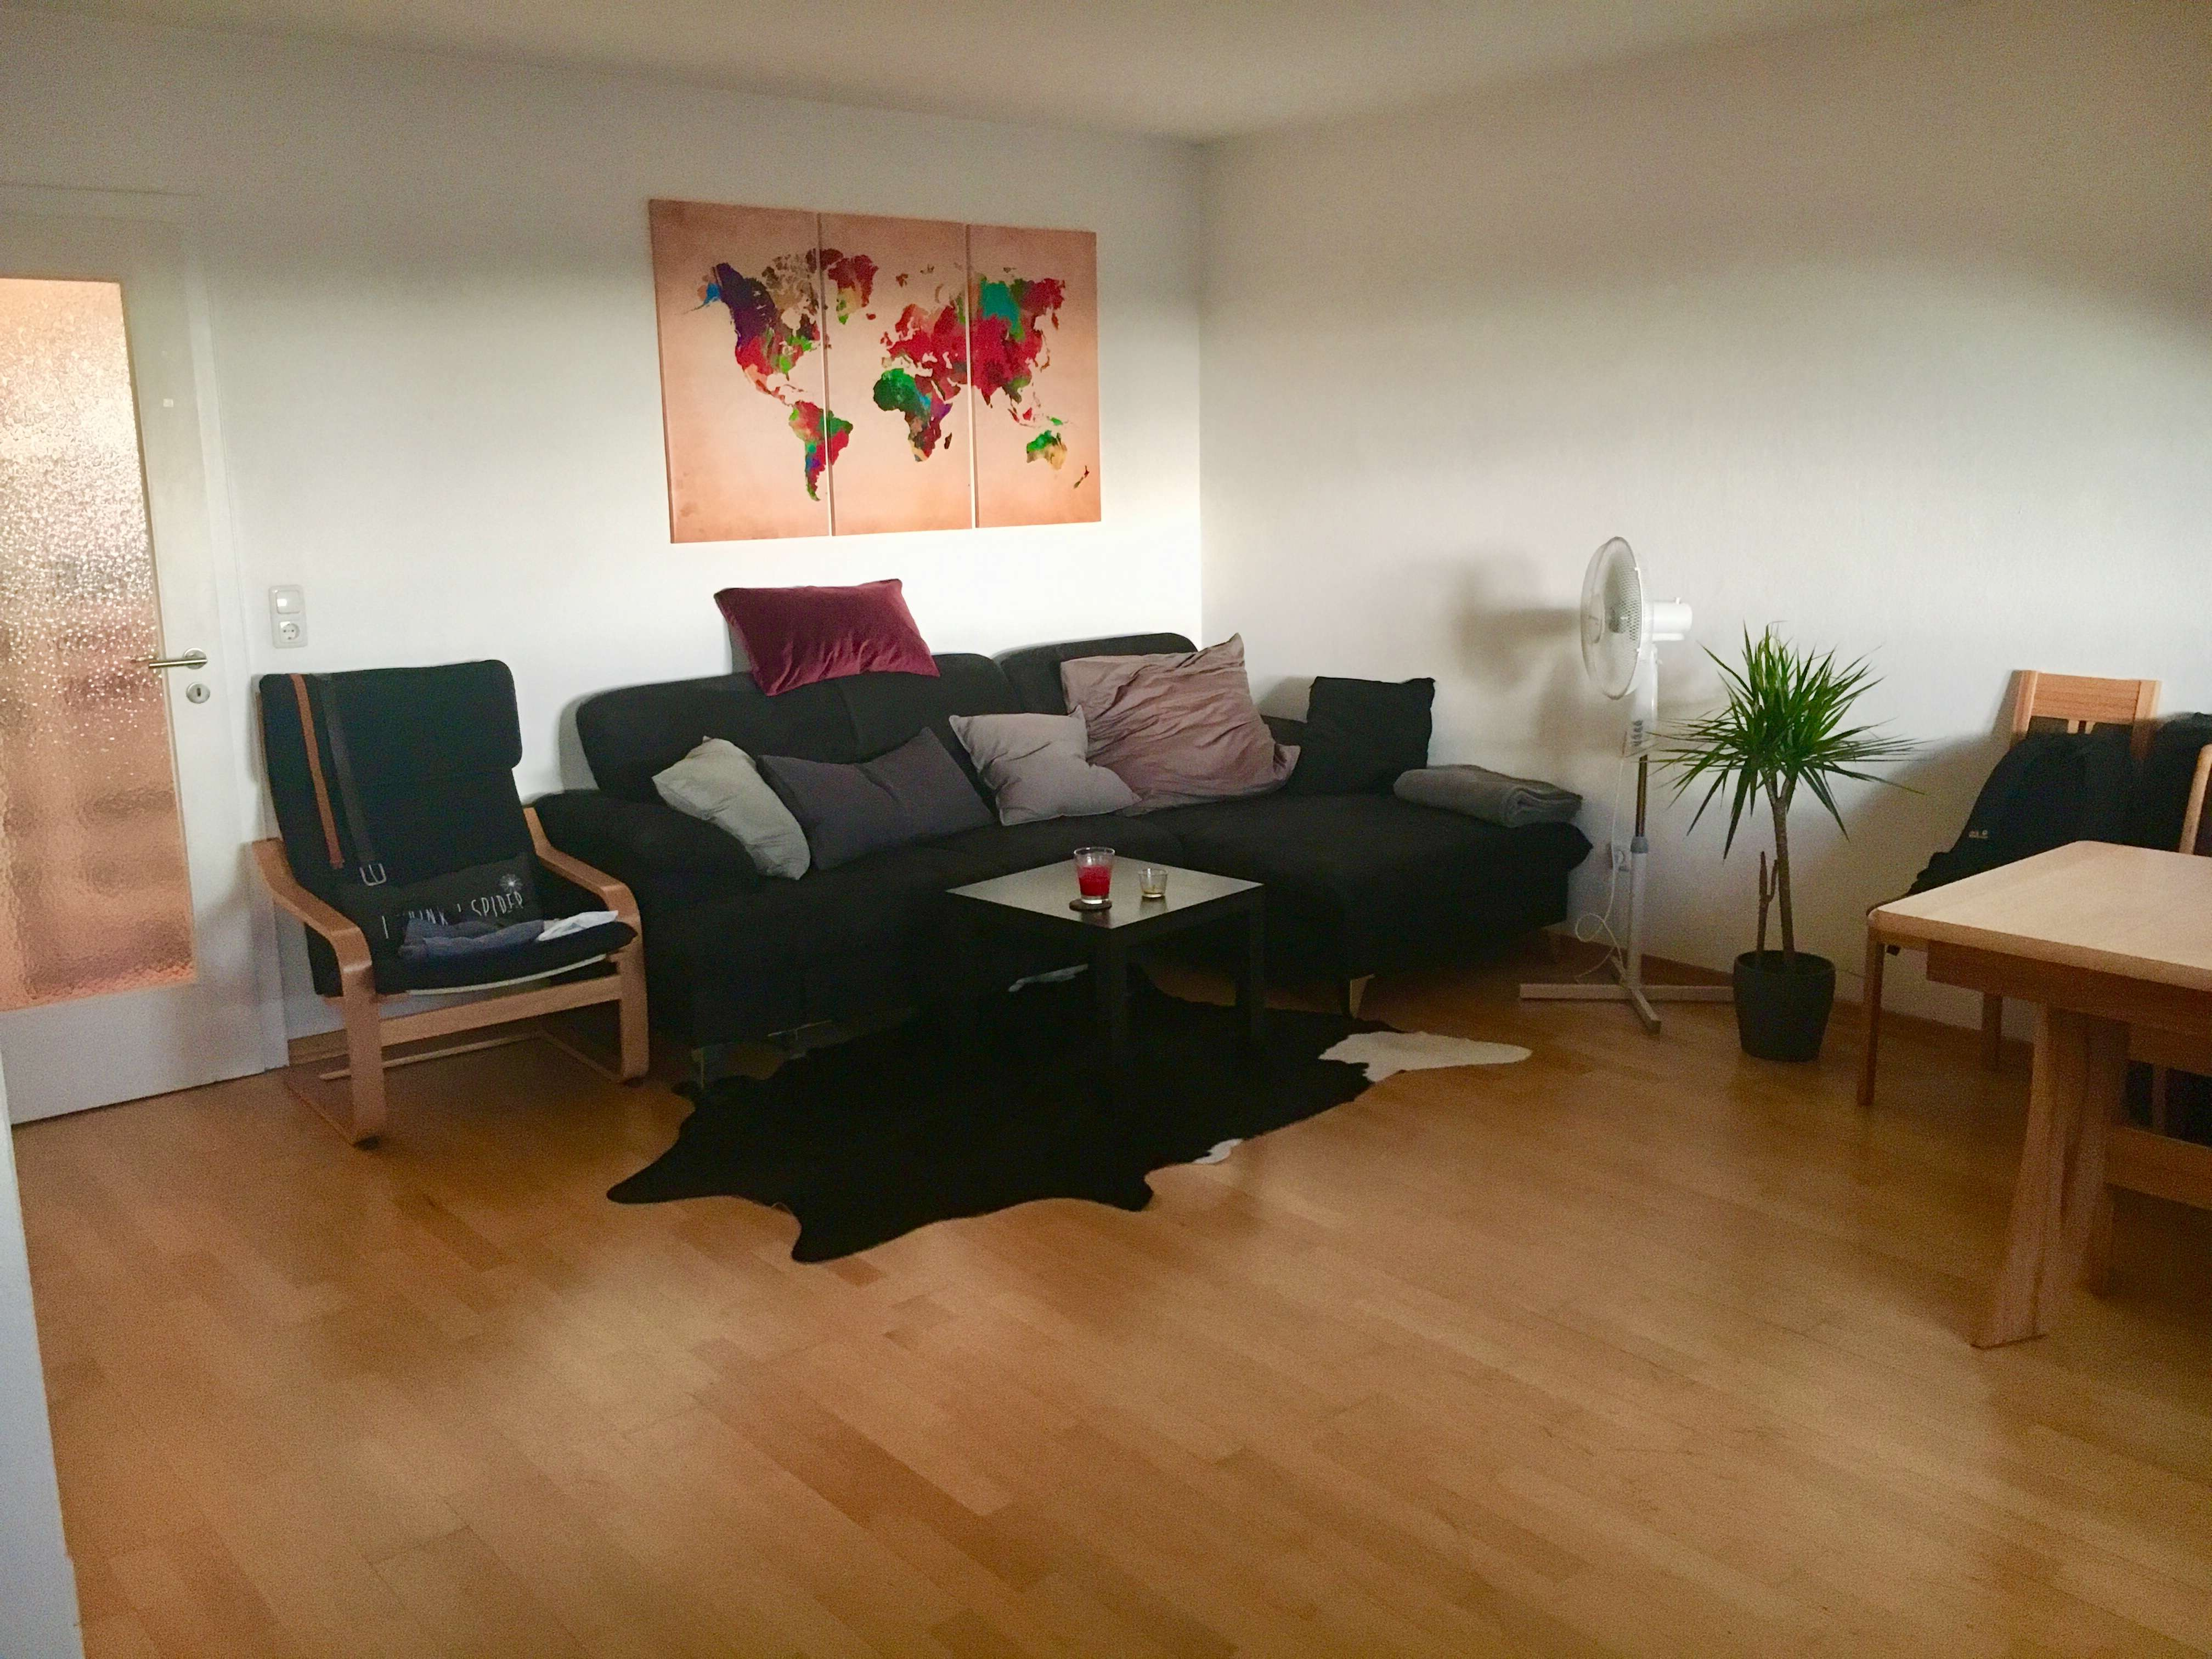 Charmantes Dachgeschoß-Appartement mit separater Küche in Mü/Giesing ab 1./15. August zu vermieten